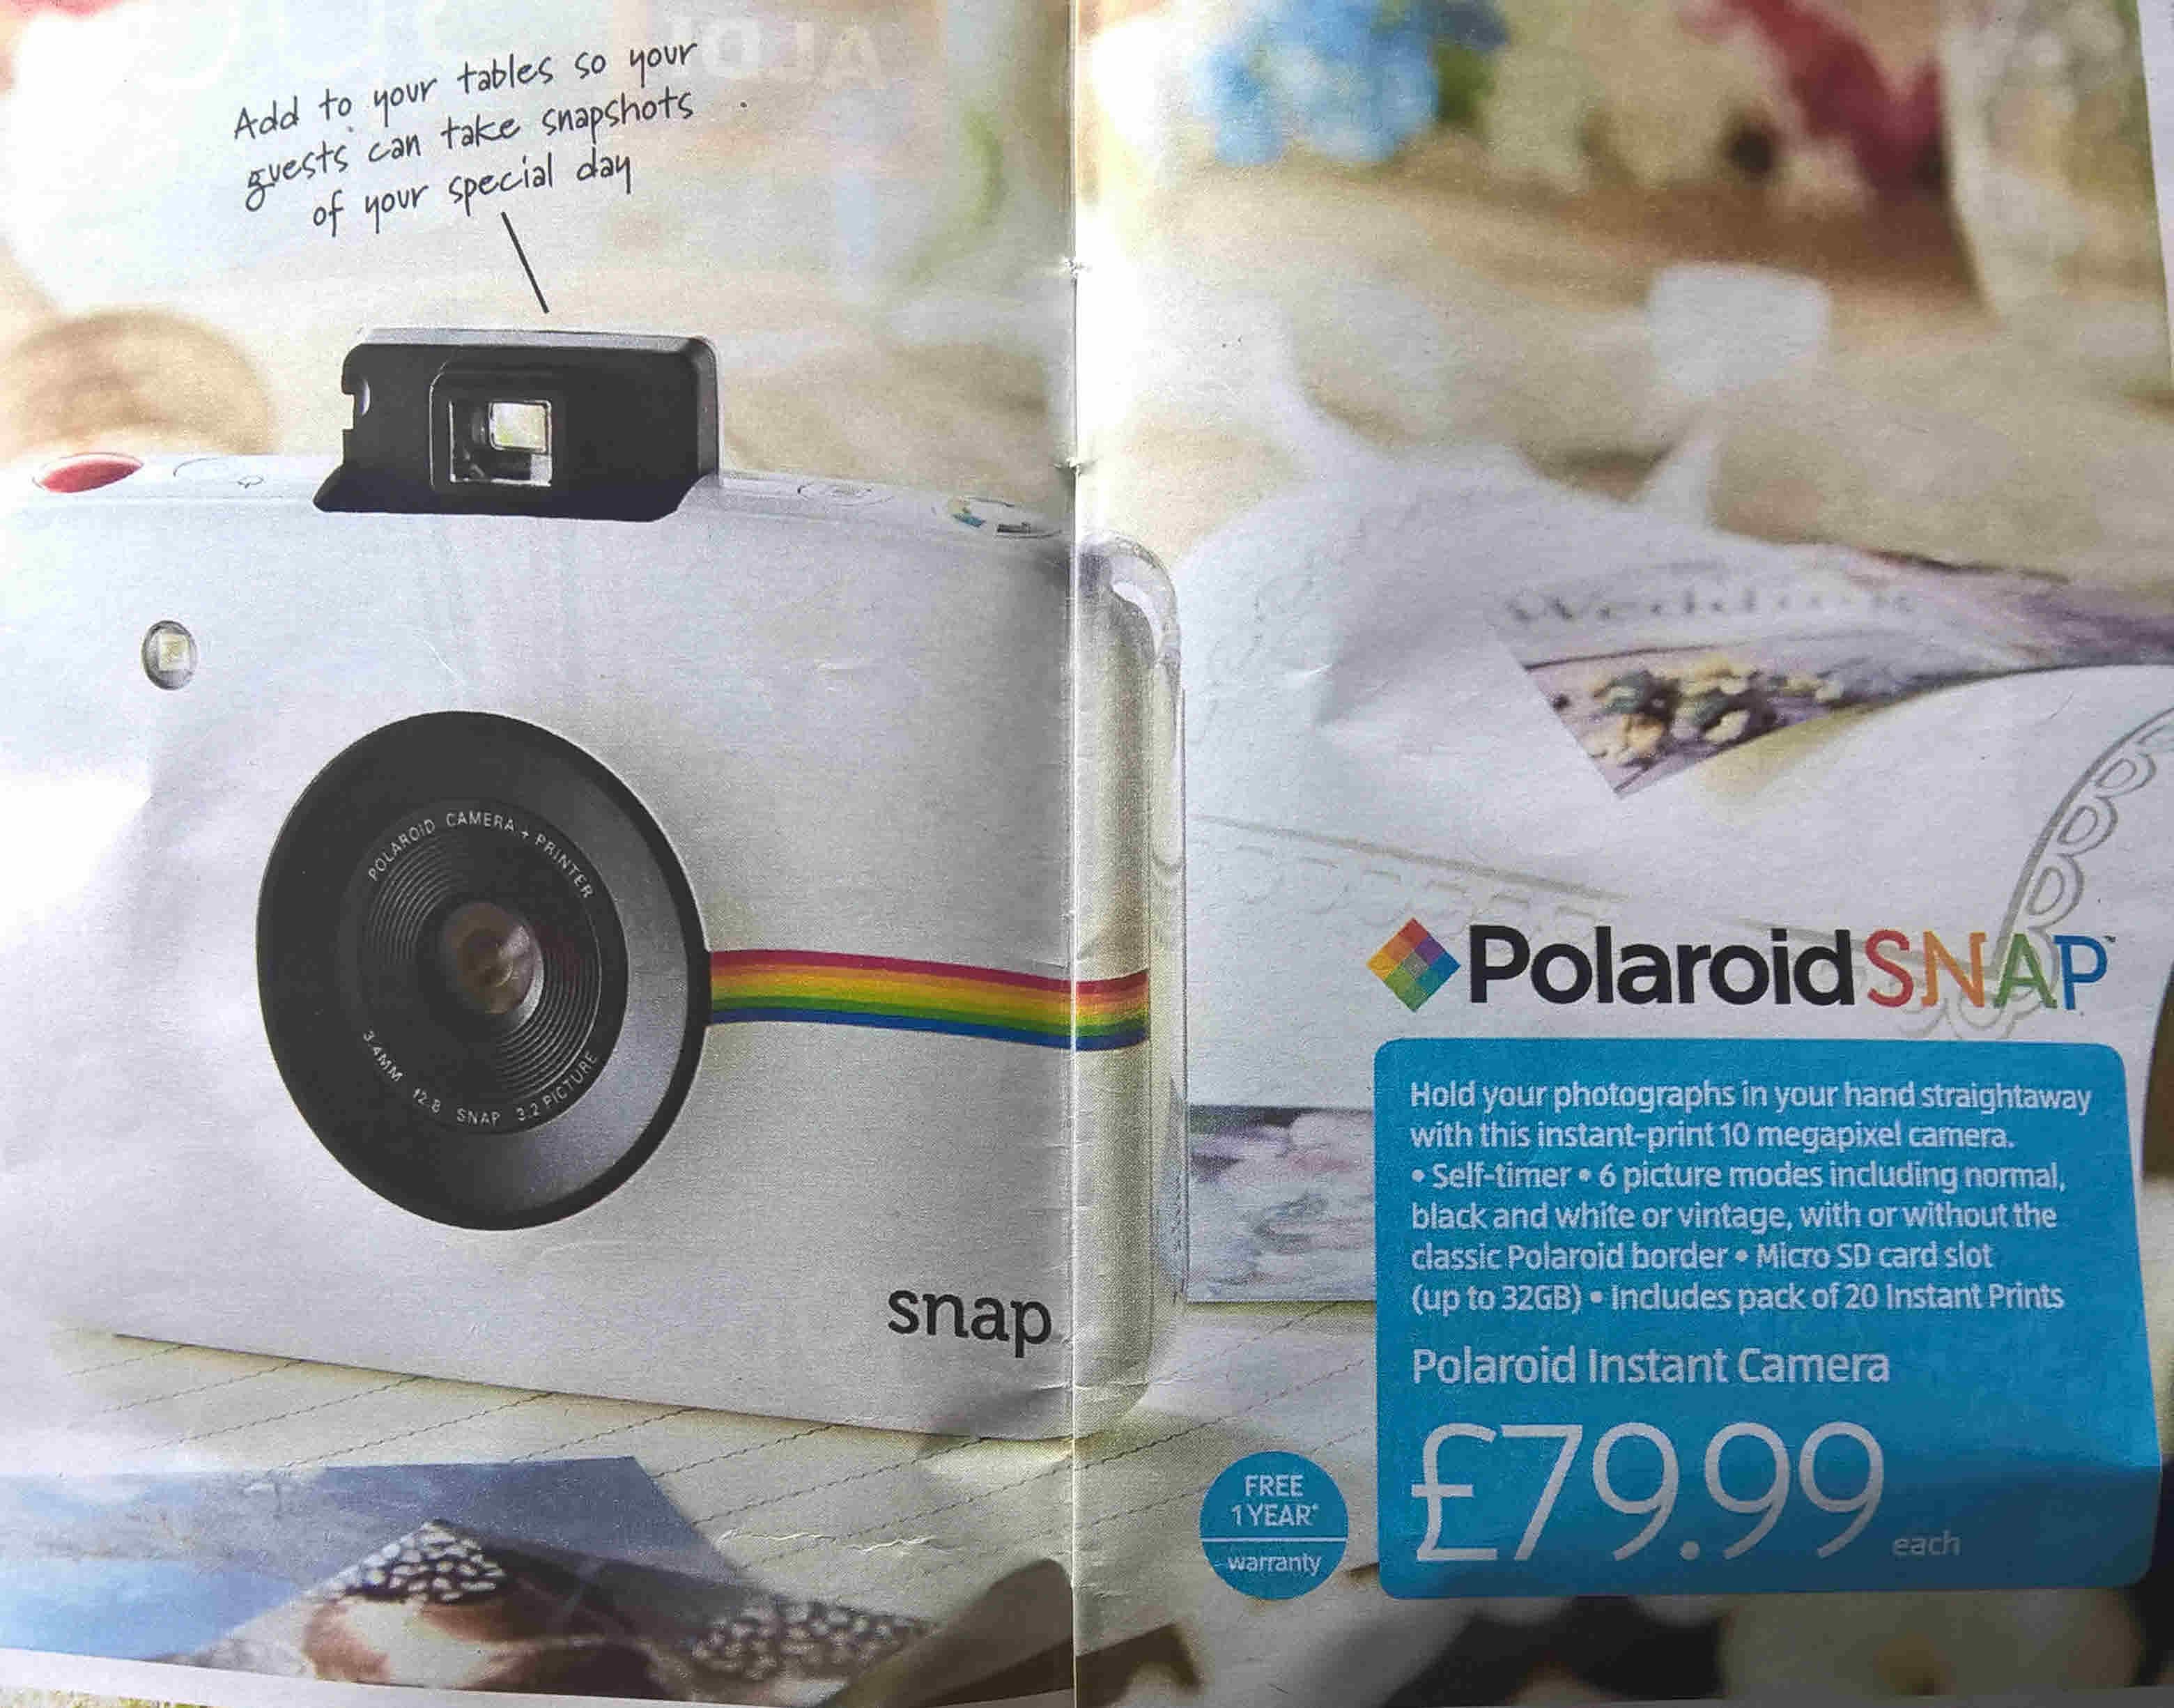 Polaroid Snap Instant Print Digital Camera @ Aldi - £79.99